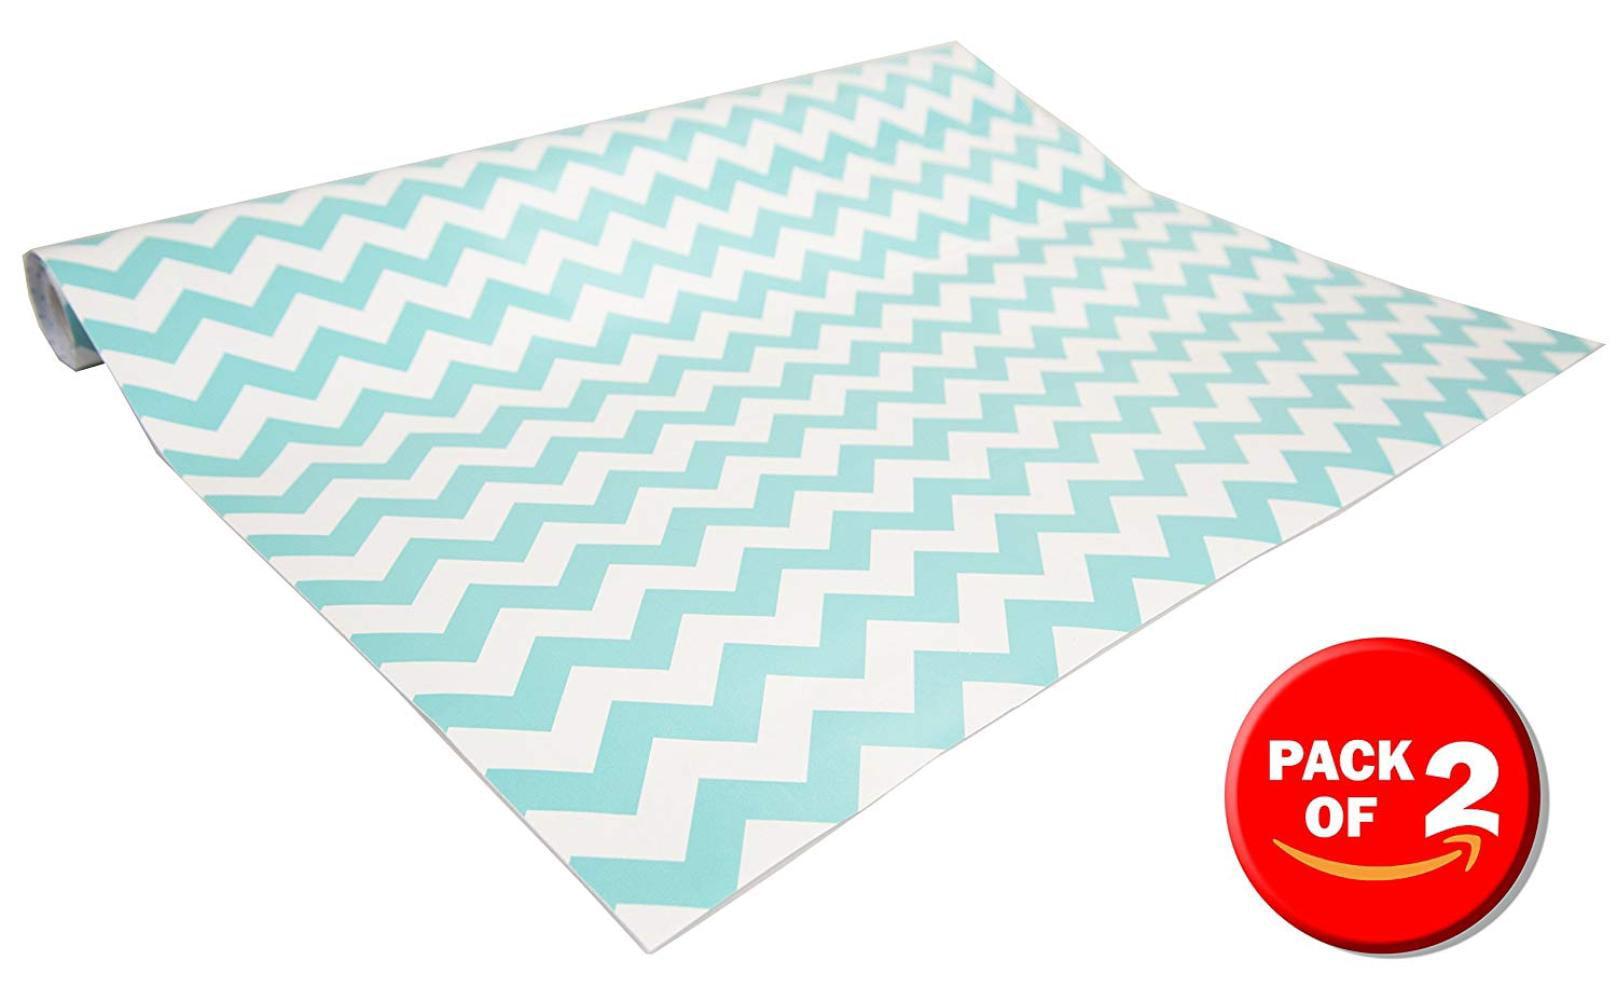 Self Adhesive Shelf Liner, 2 Pack (Chevron Blue), Drawers